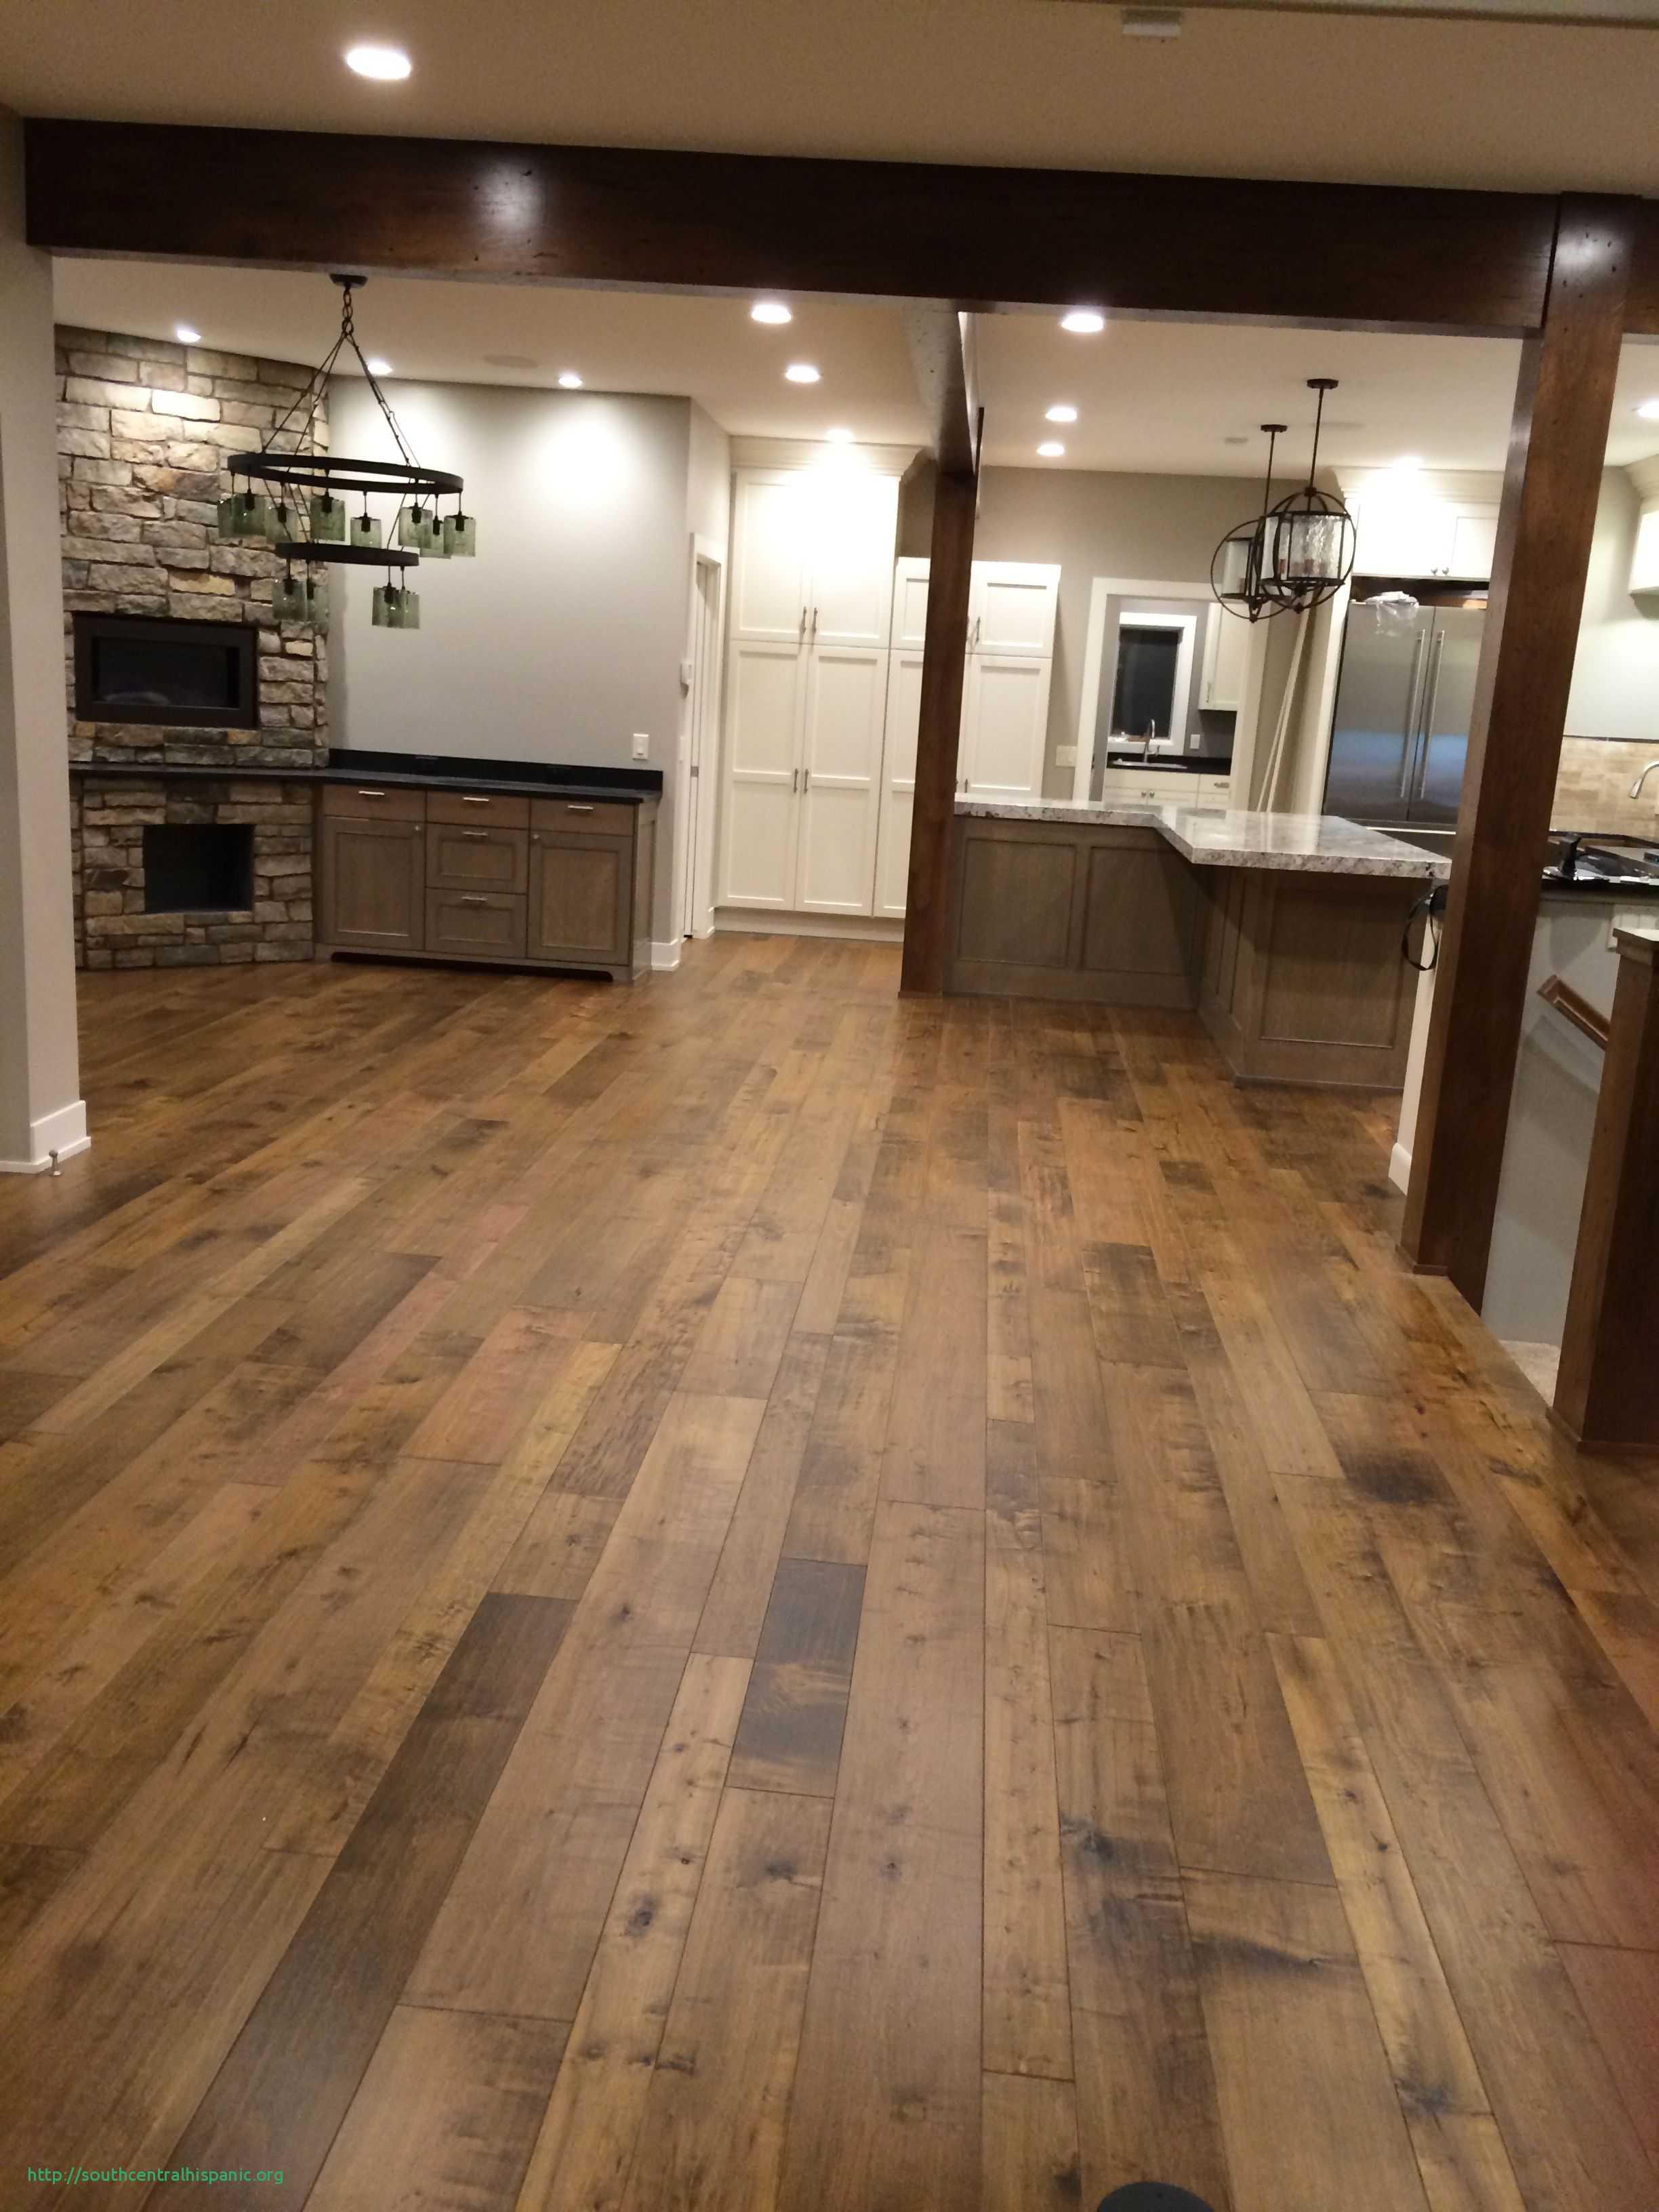 5 white oak hardwood flooring of 17 inspirant engineered wood flooring deals ideas blog throughout 17 photos of the 17 inspirant engineered wood flooring deals